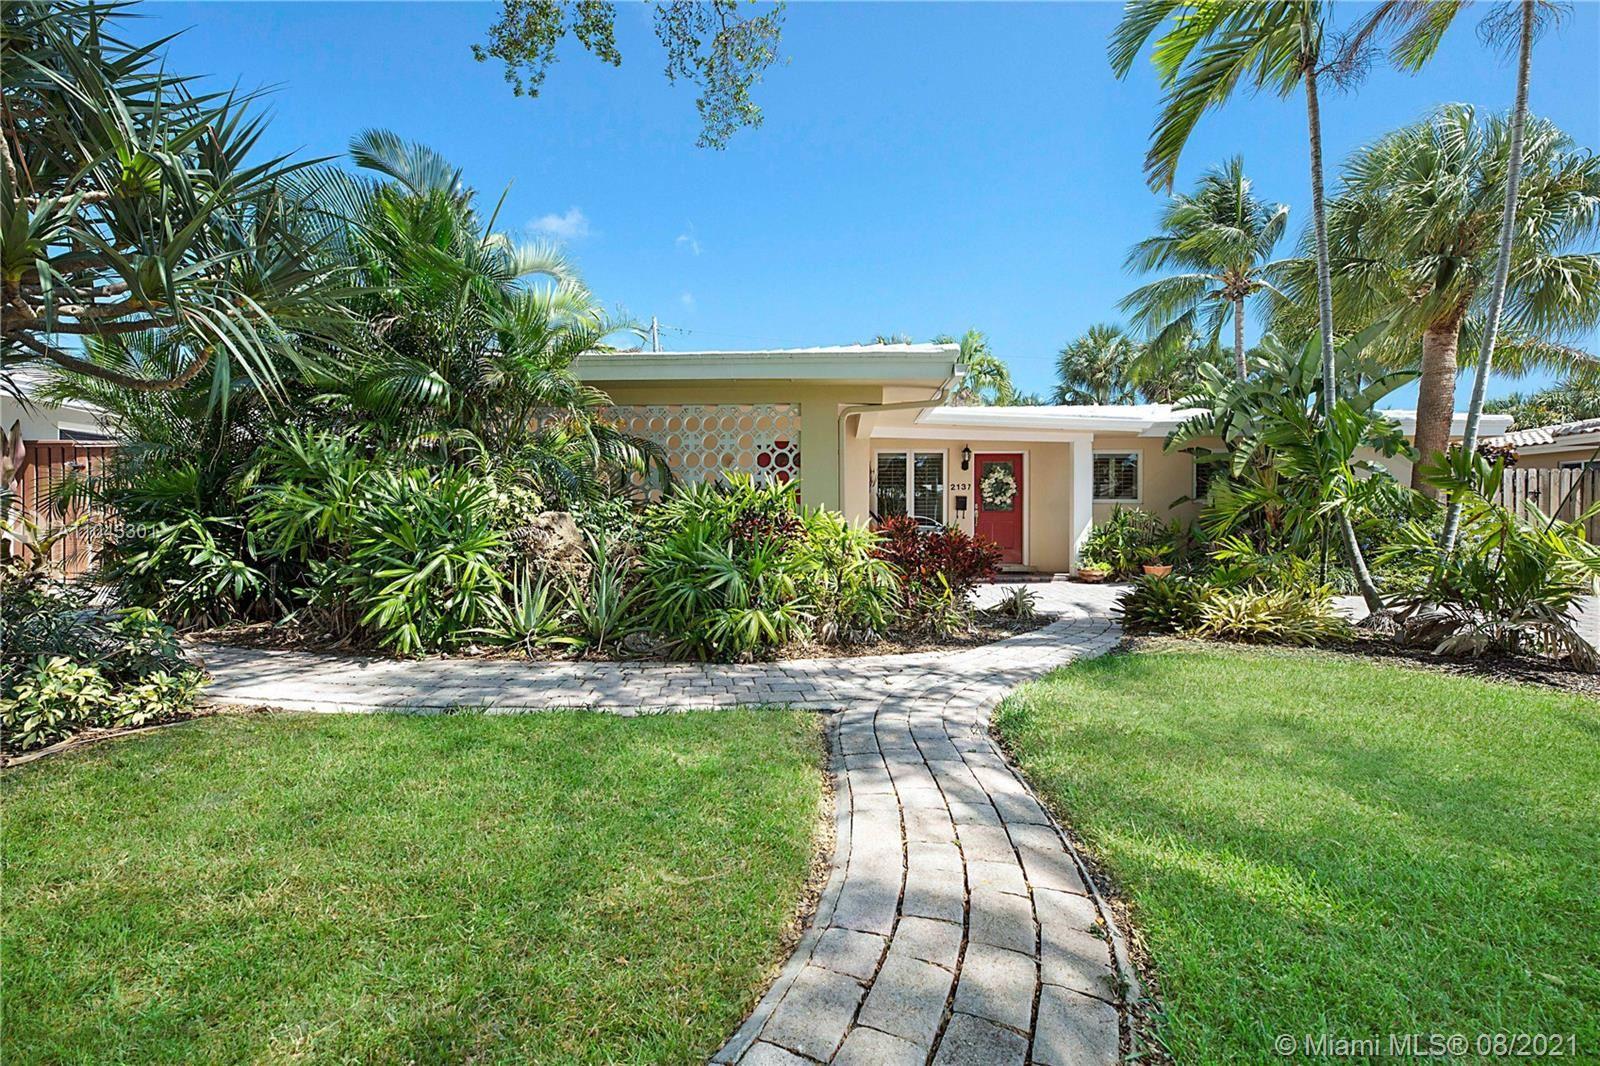 2137 NE 58th Ct, Fort Lauderdale, FL 33308 - #: A11043301